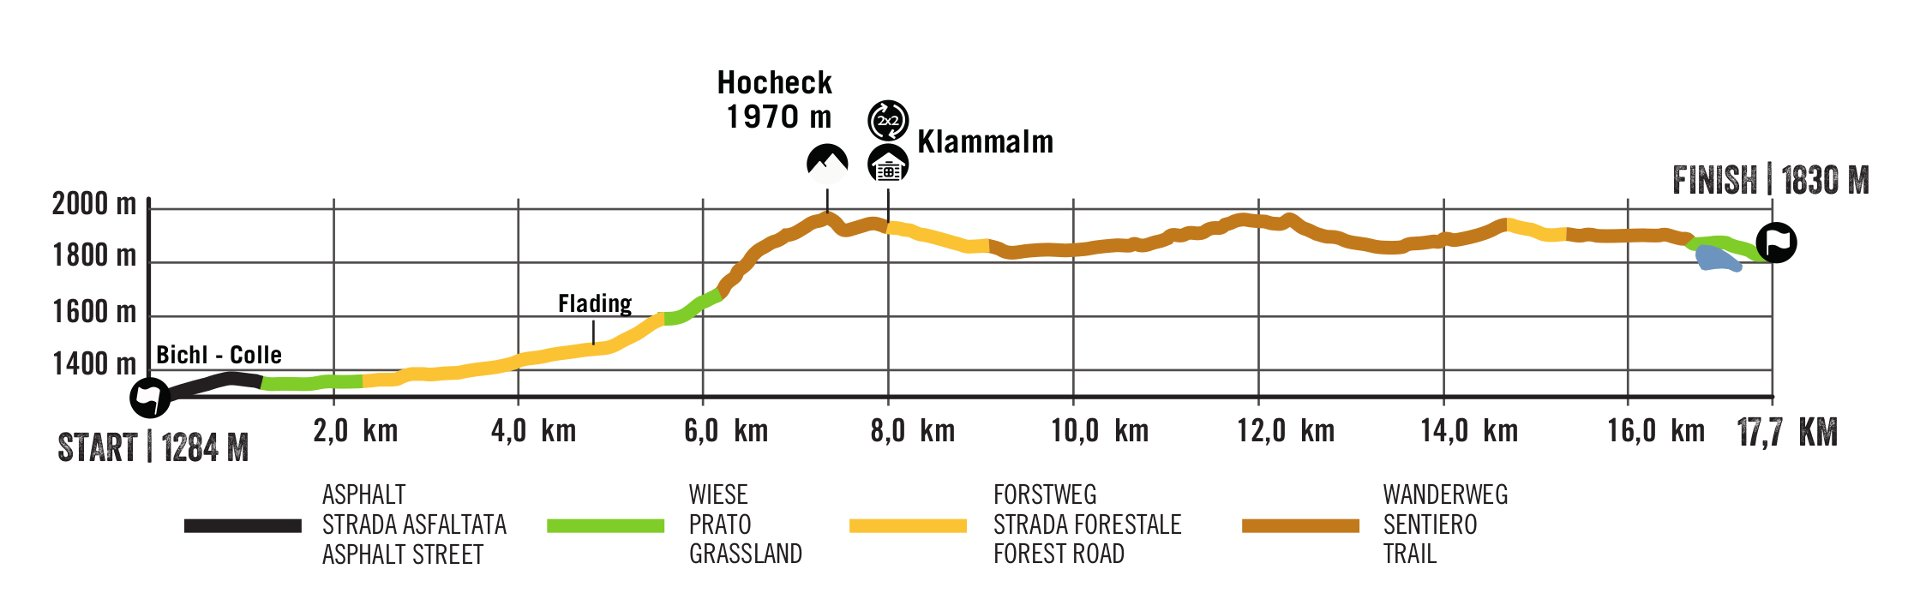 Ratschings Mountaintrail Elevation Profile